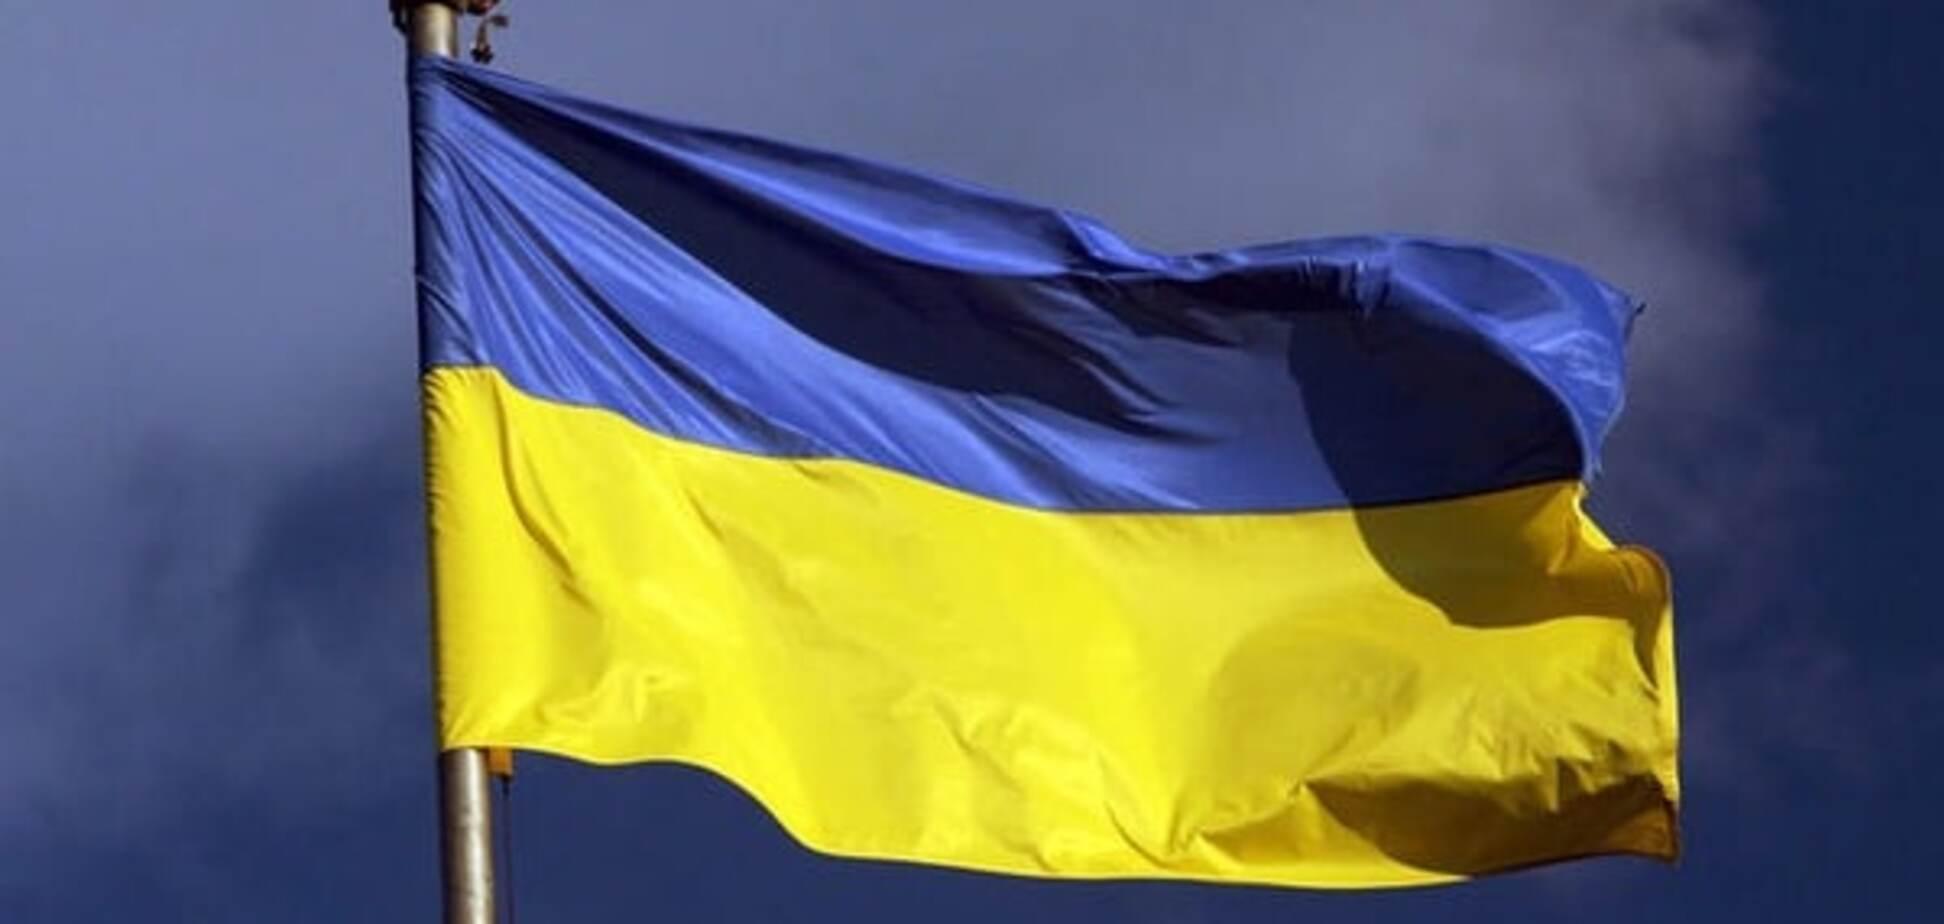 Вызов времени: в Carnegie Europe объяснили, прошла ли Украина точку невозврата